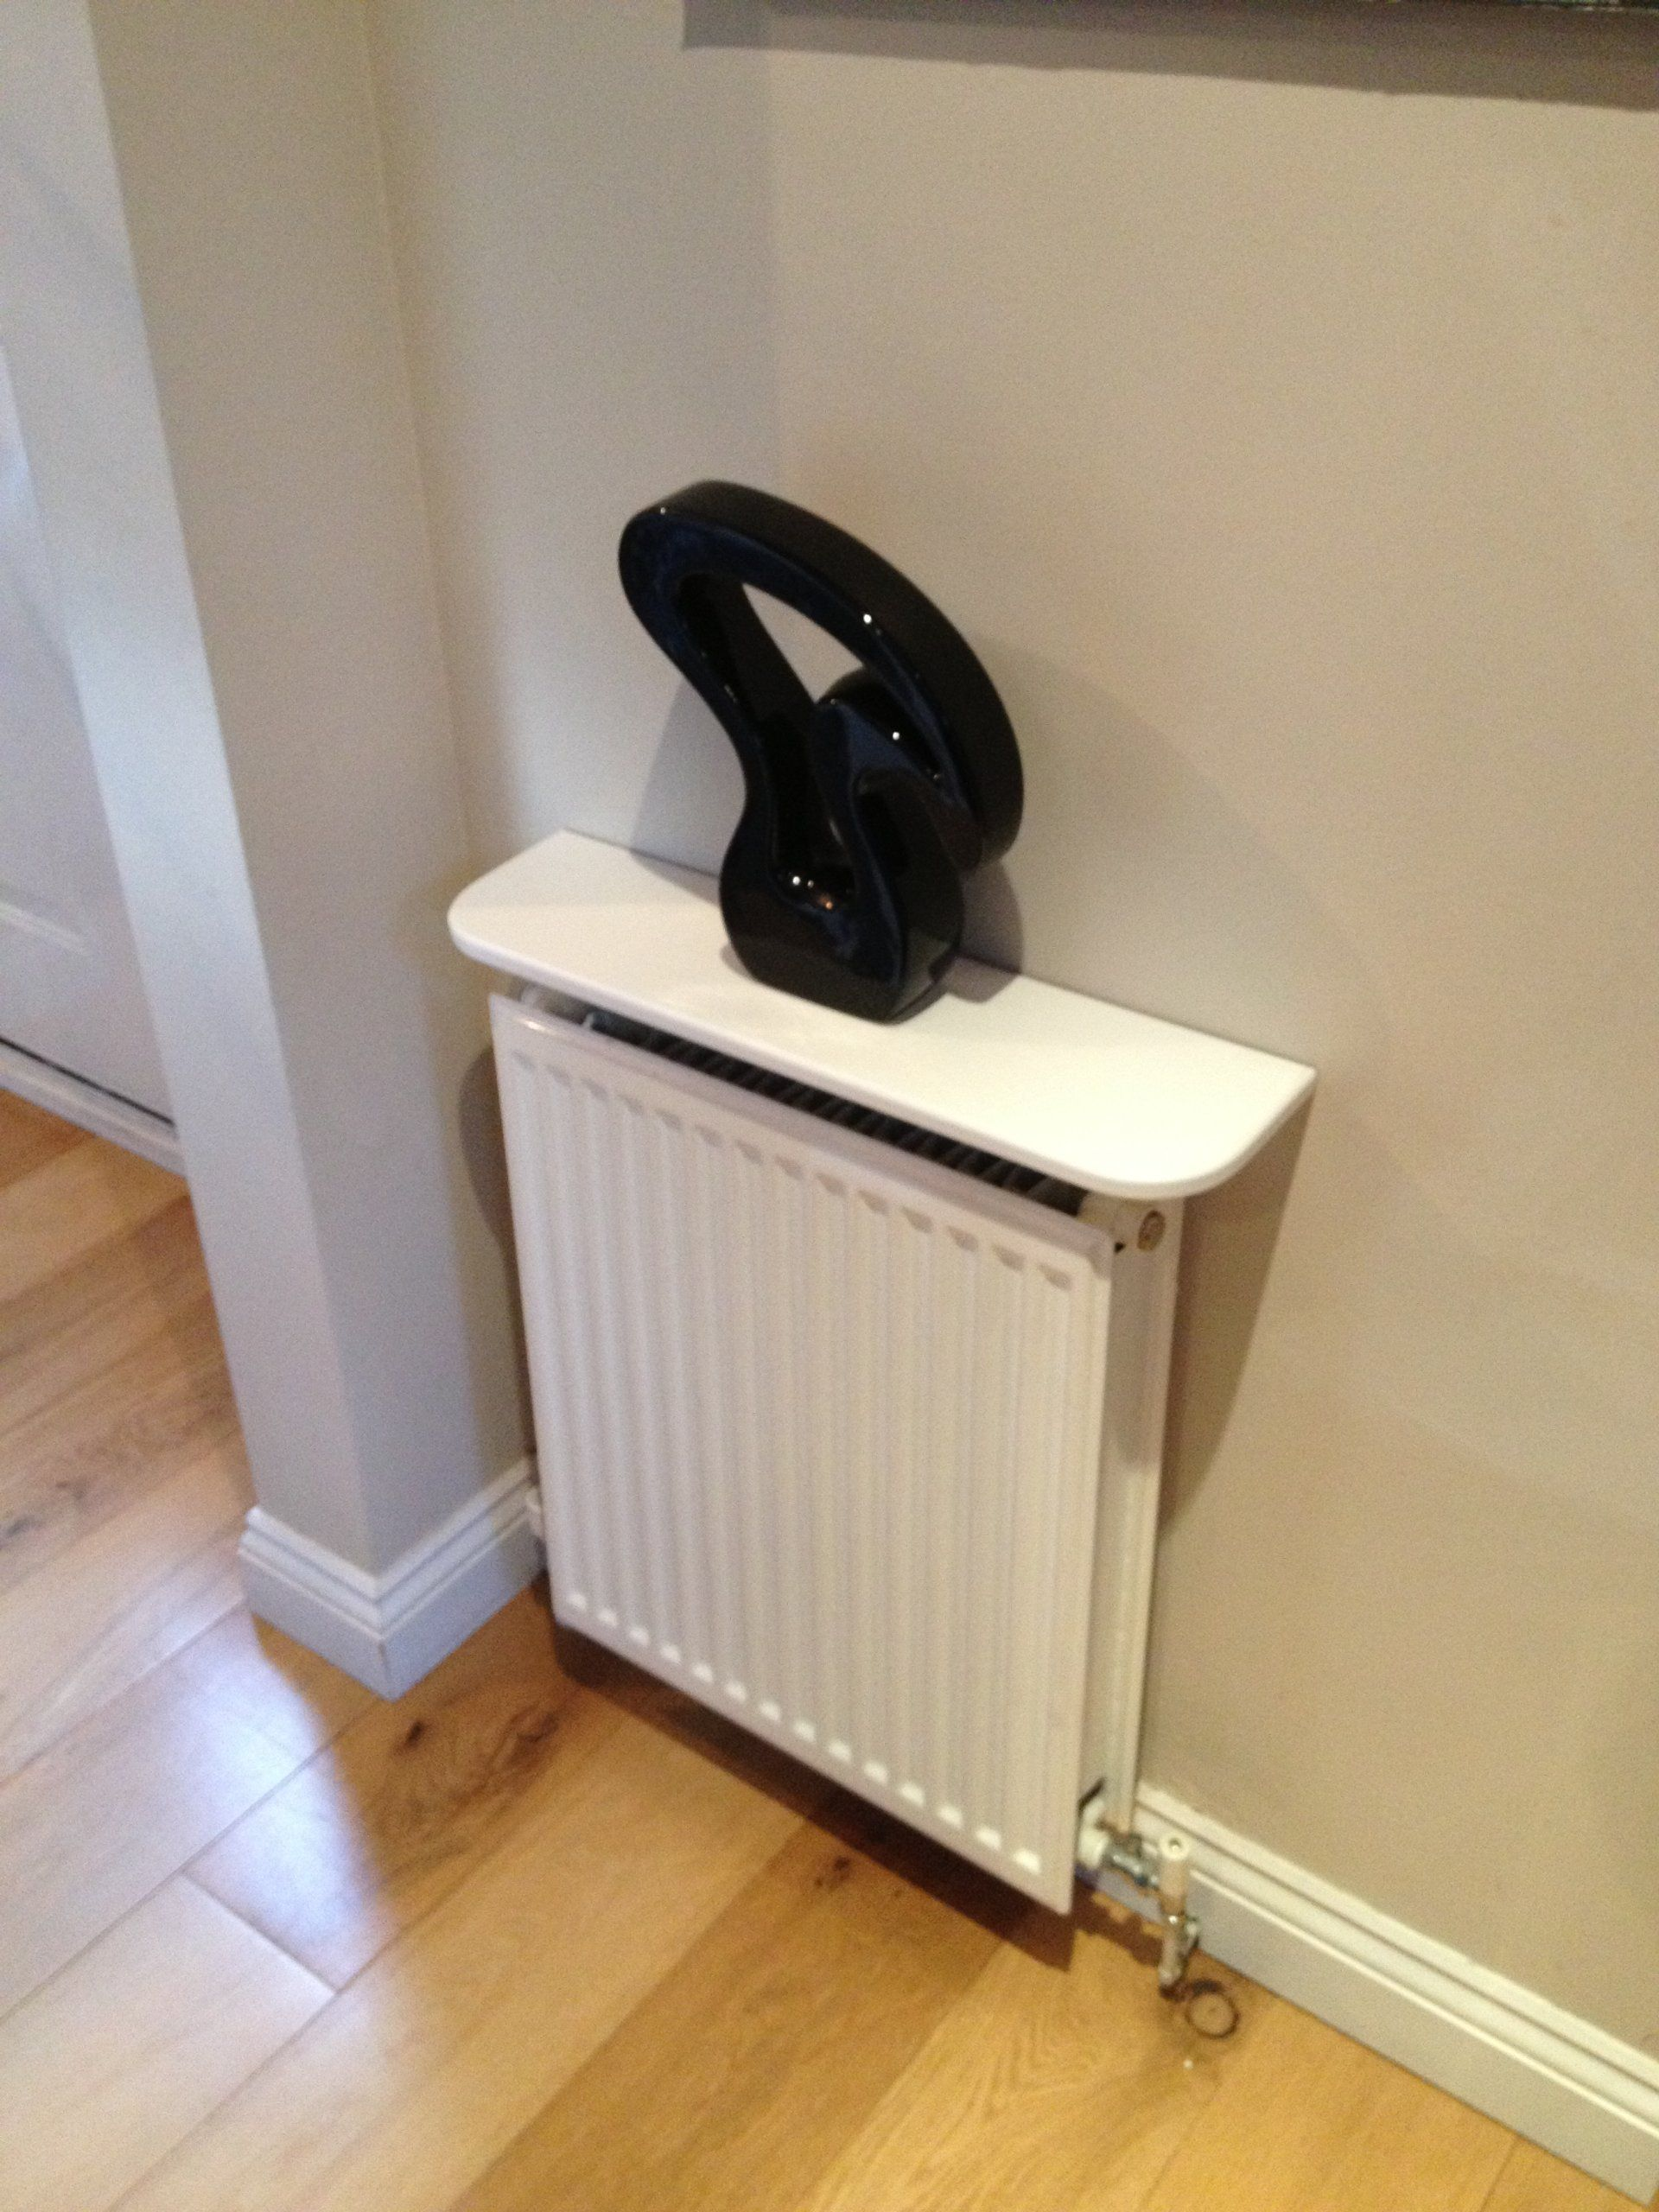 White Radiator Shelf - 600mm: Amazon.co.uk: Kitchen & Home